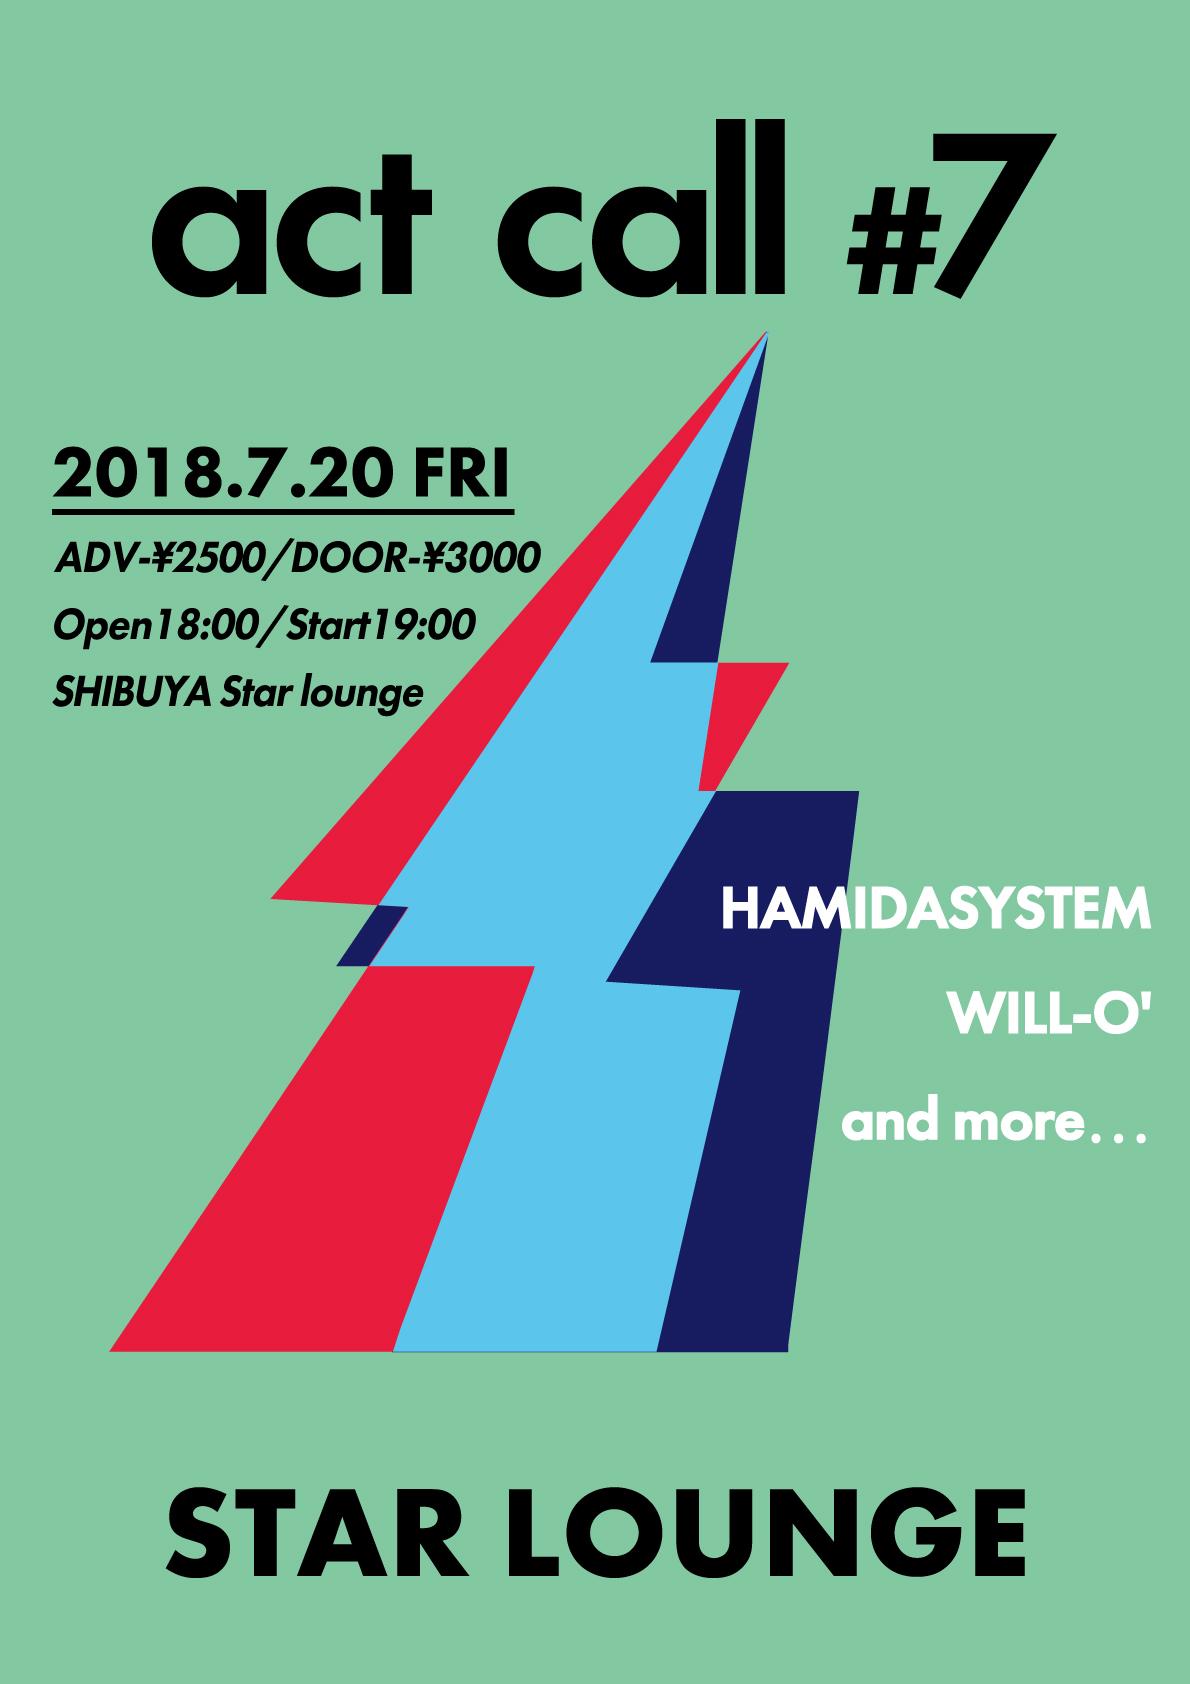 HAMIDASYSTEM presents「act call #7」